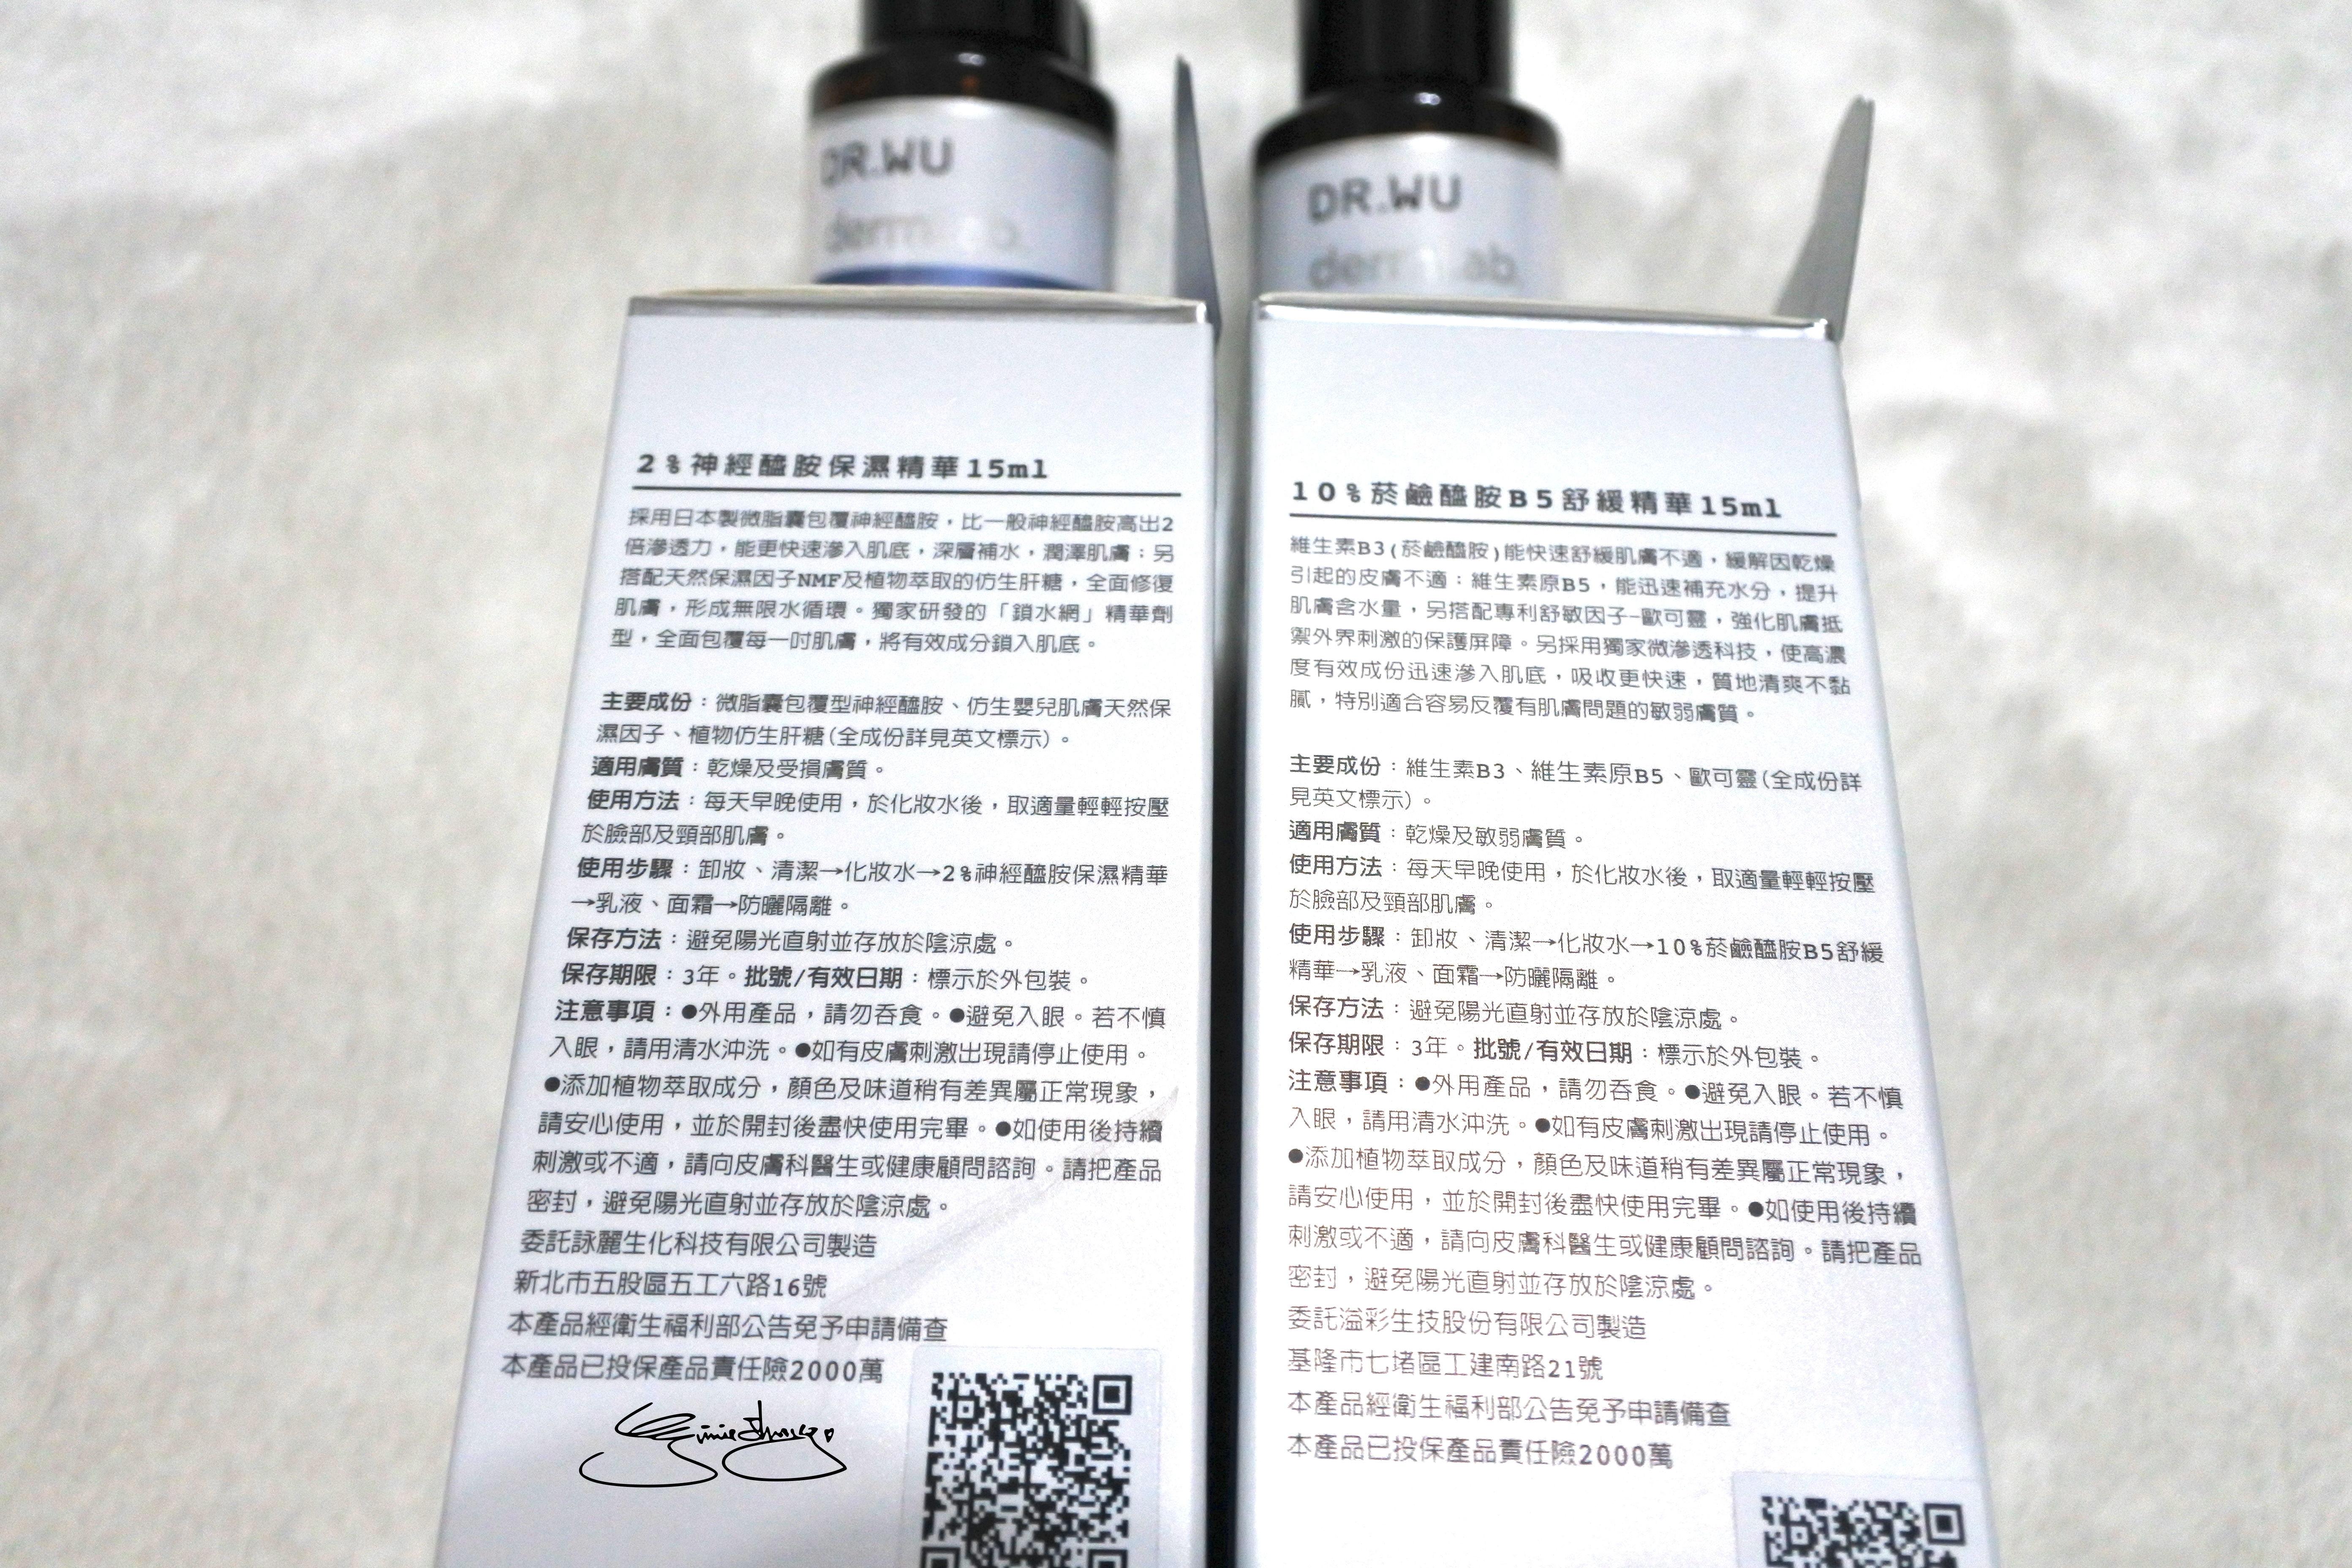 Dr.Wu 實驗室保濕 2%神經醯胺保濕精華 10%菸鹼醯胺B5舒緩精華